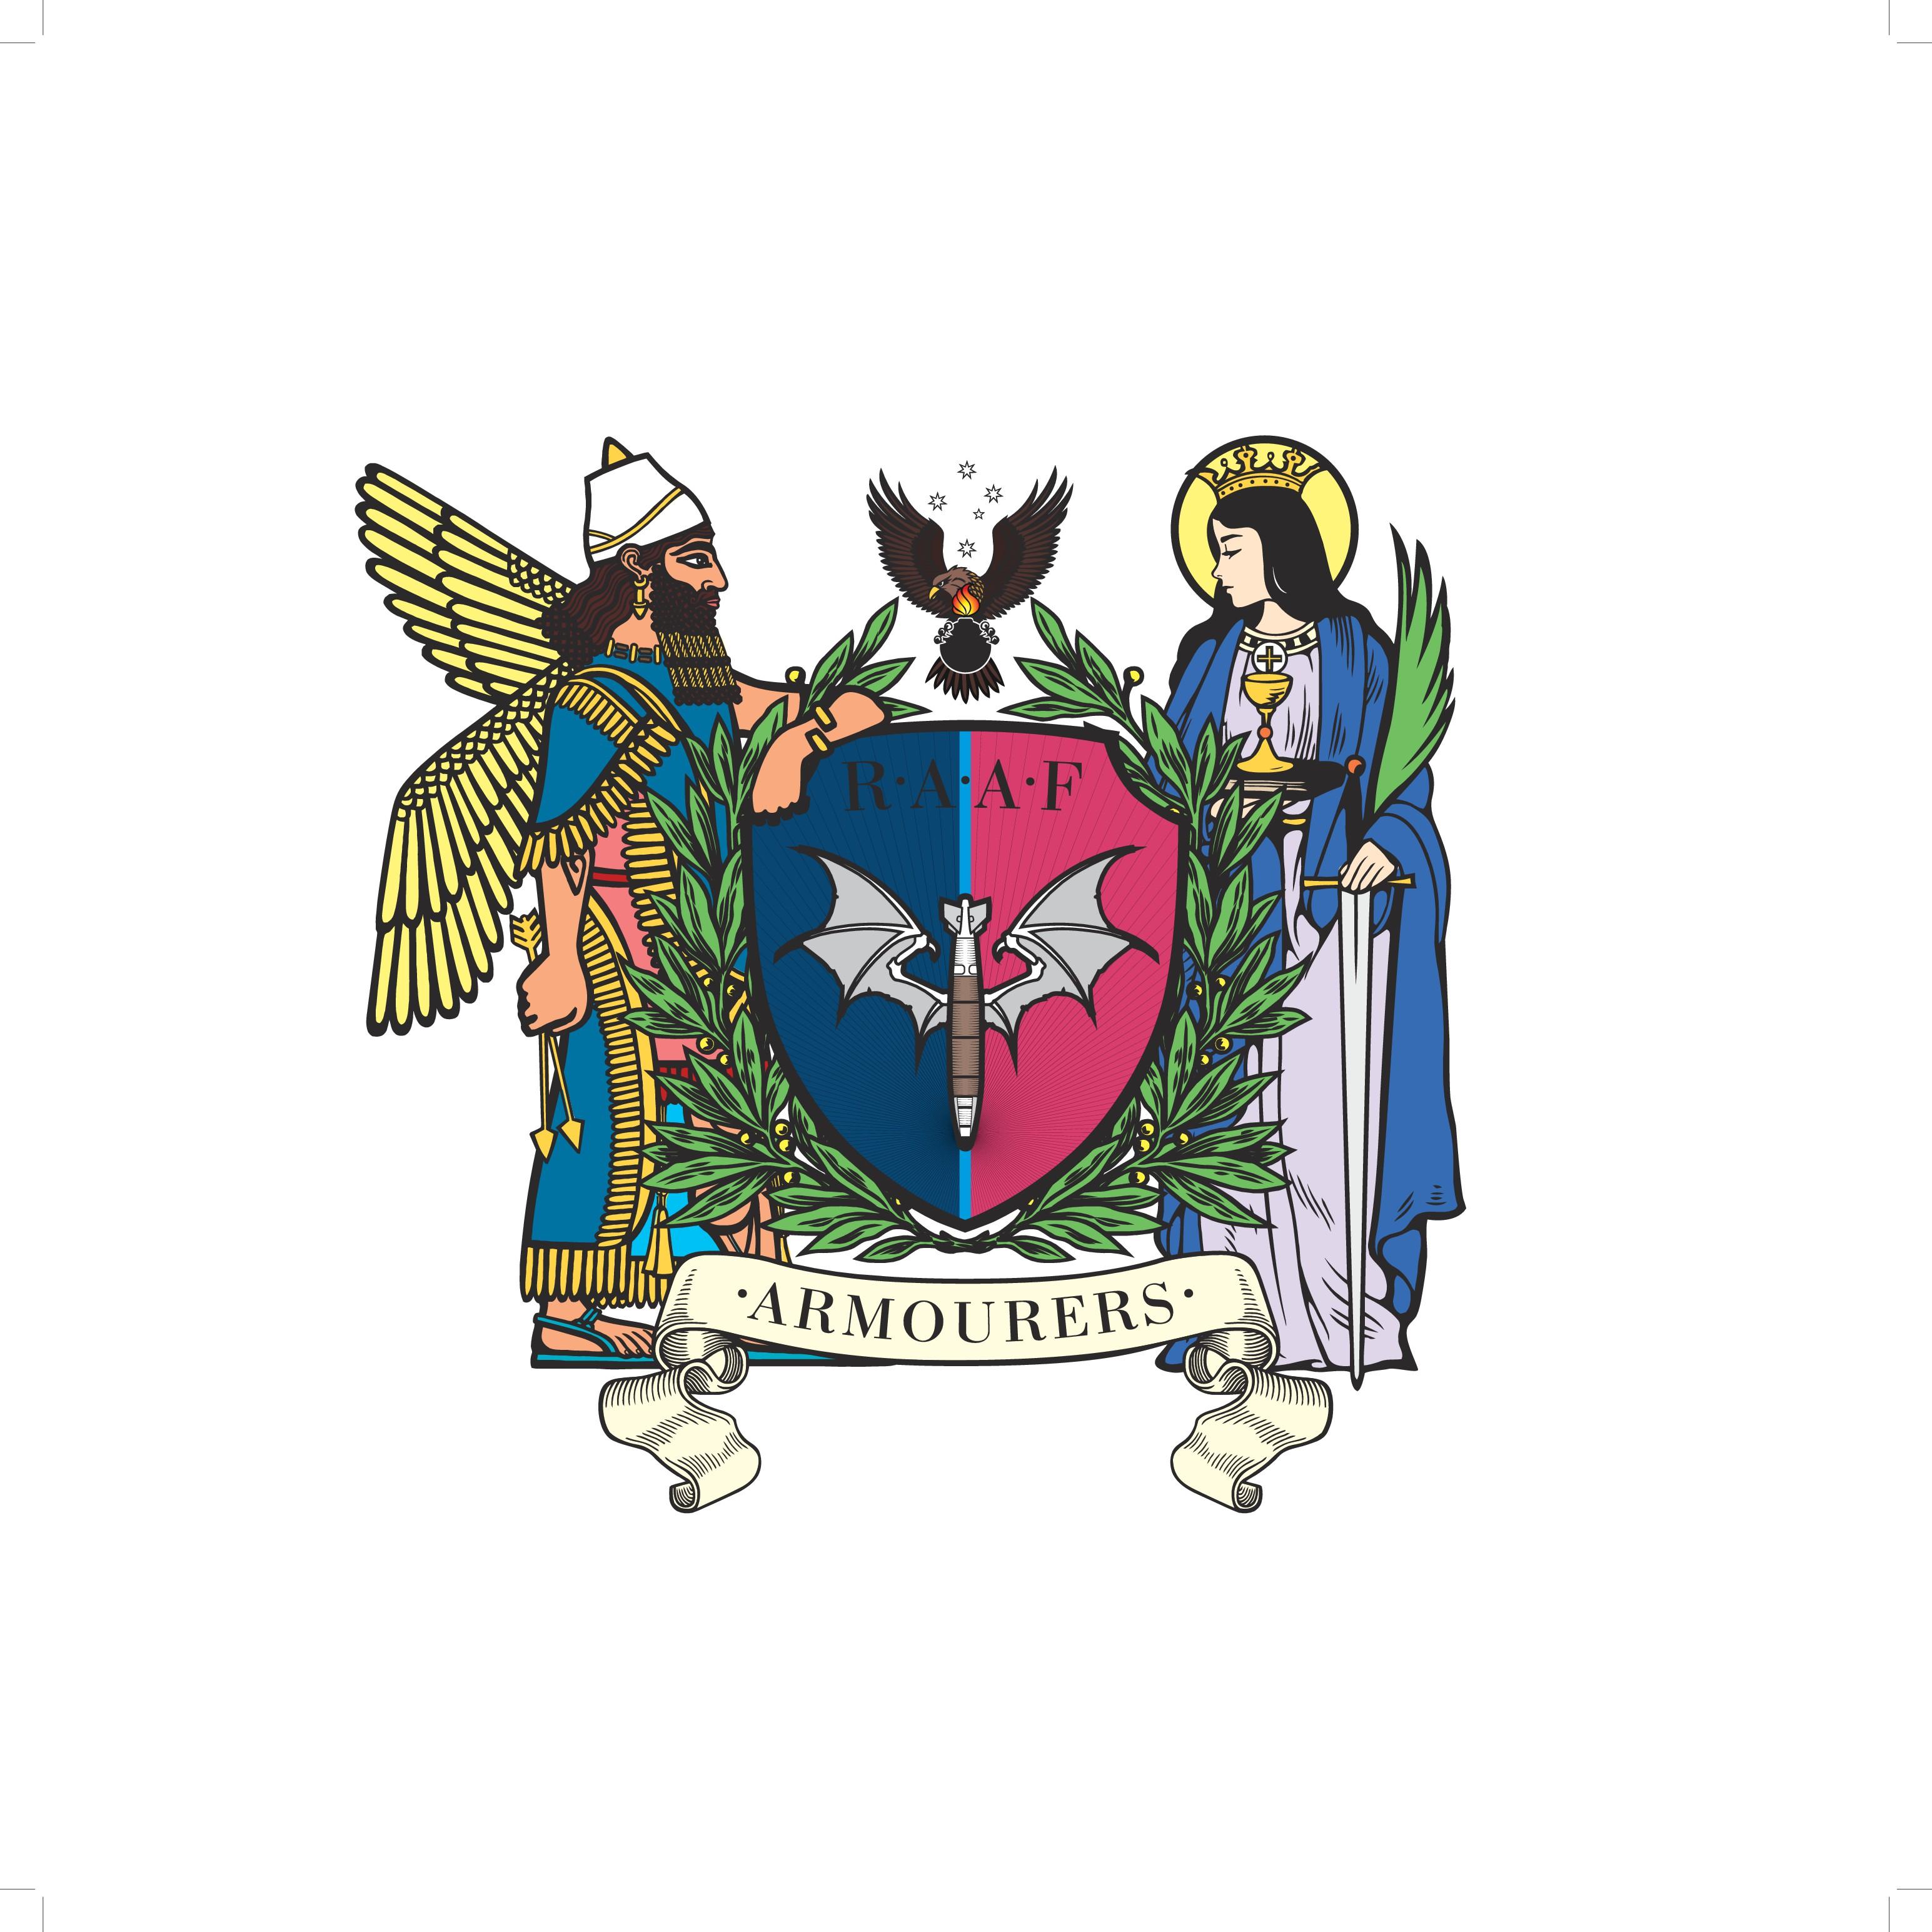 Design a military crest for the Australian Armourer's flag